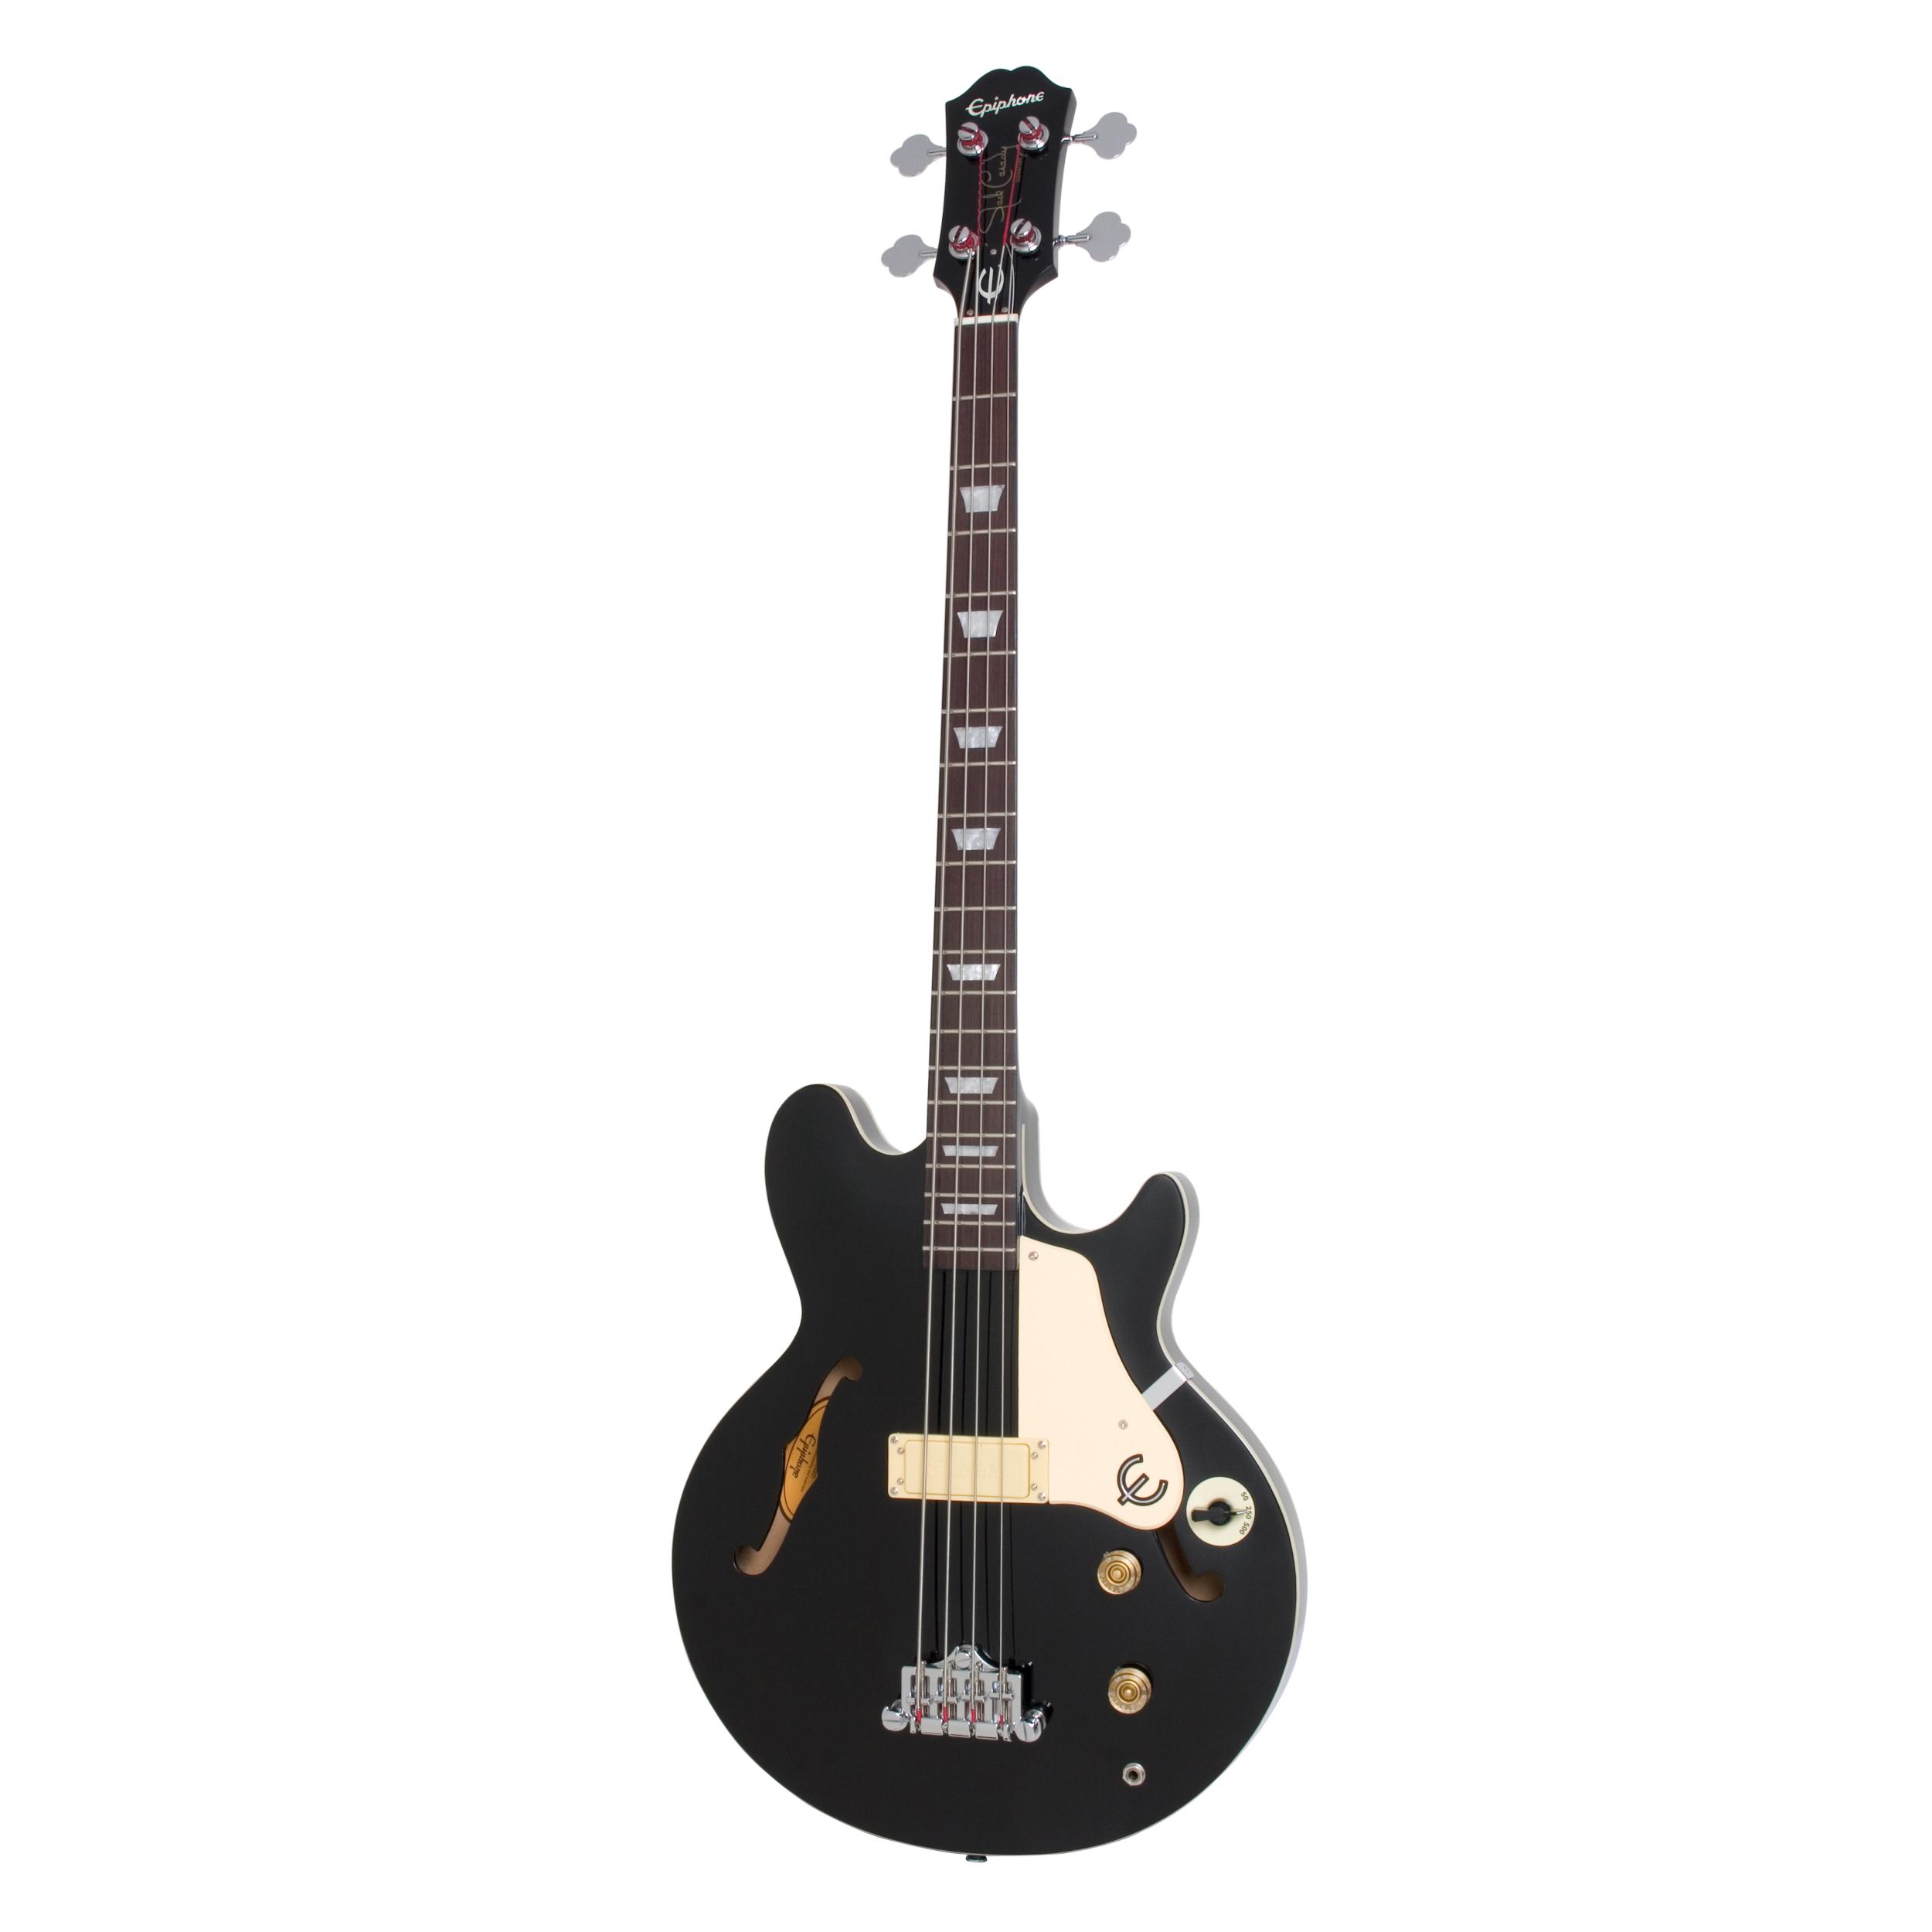 Epiphone Jack Casady Bass - Ebony Black Guitar